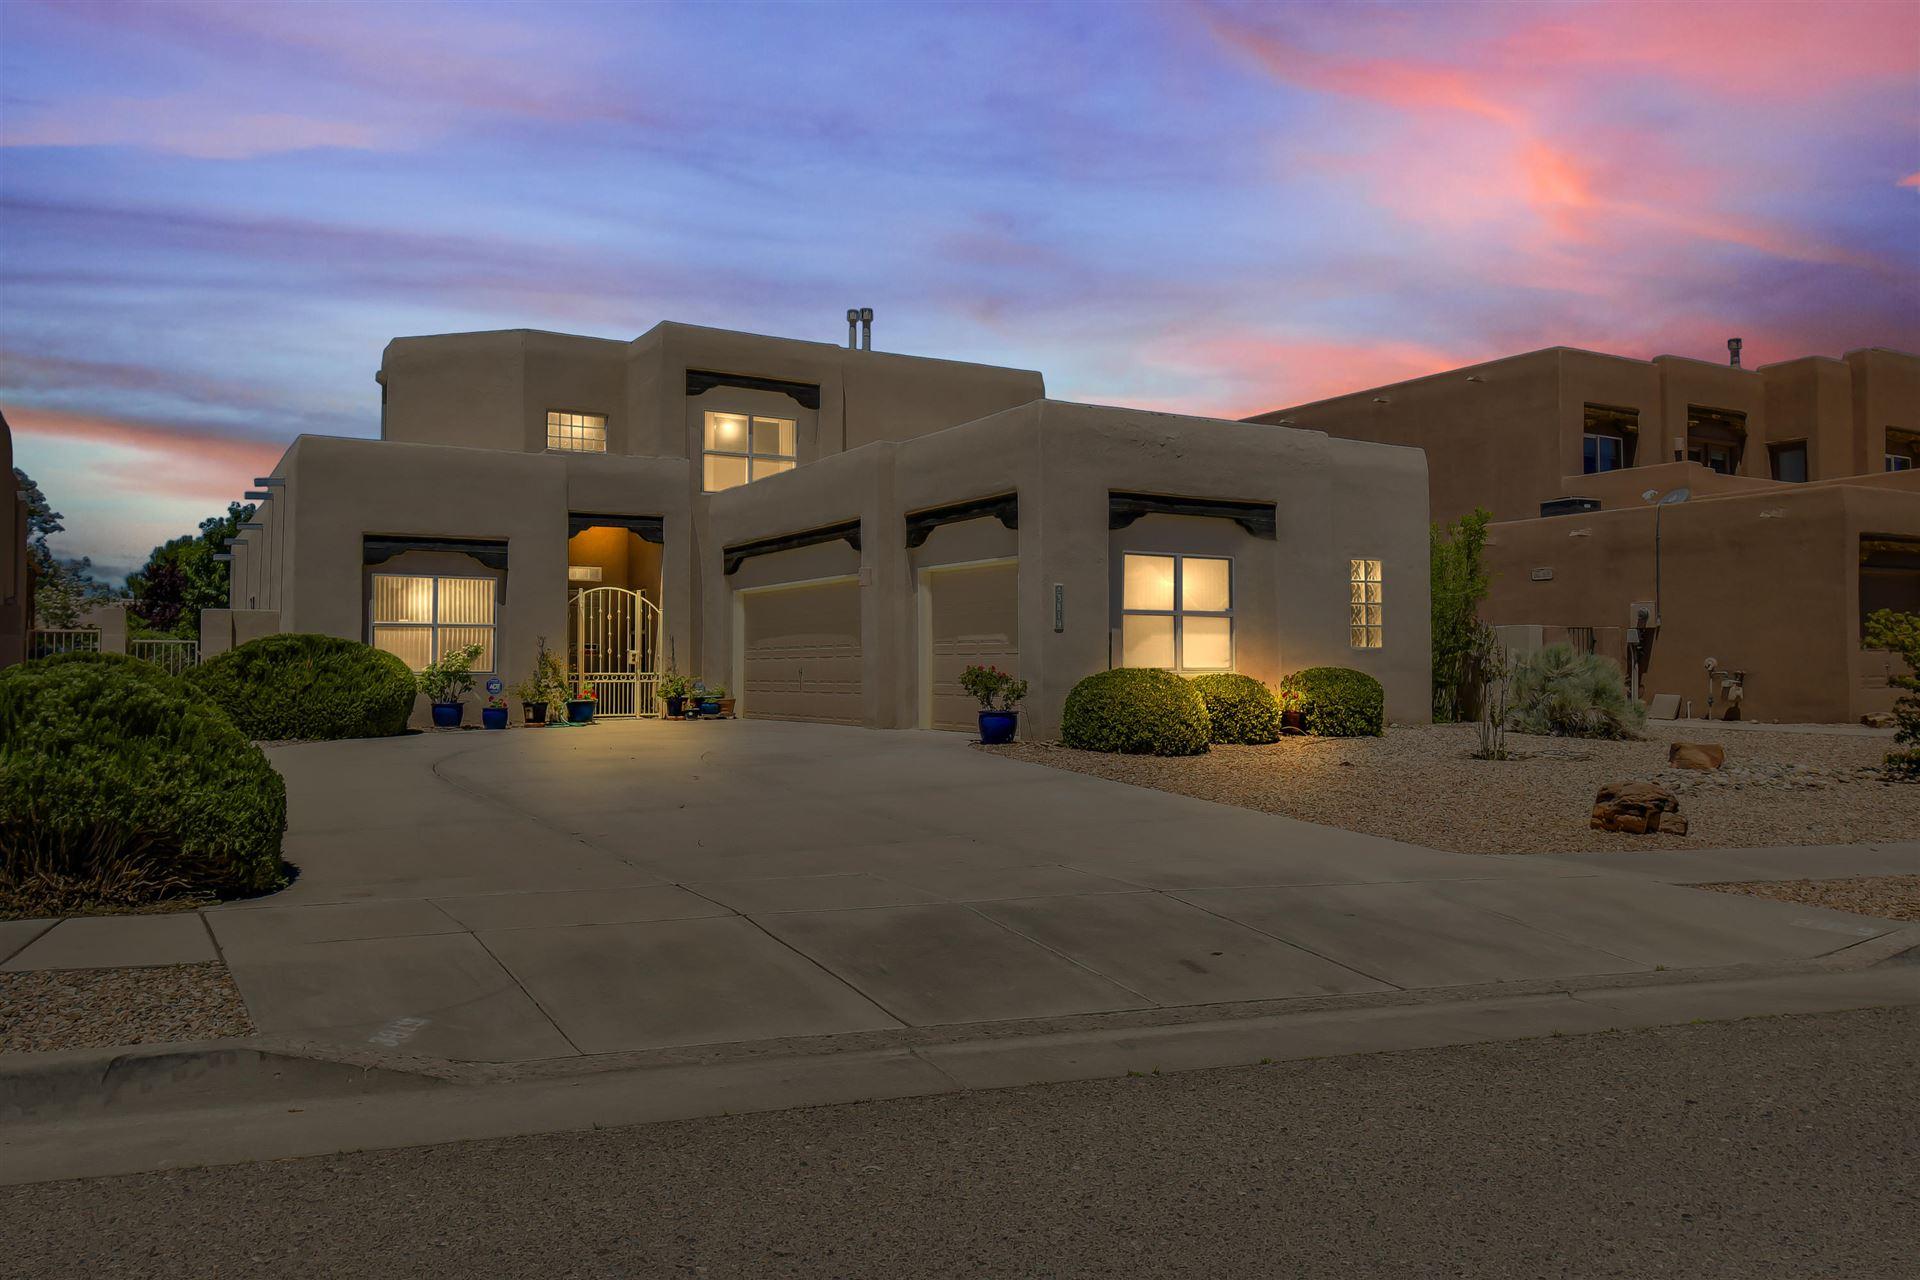 Photo of 3819 ALAMOGORDO Drive NW, Albuquerque, NM 87120 (MLS # 993993)